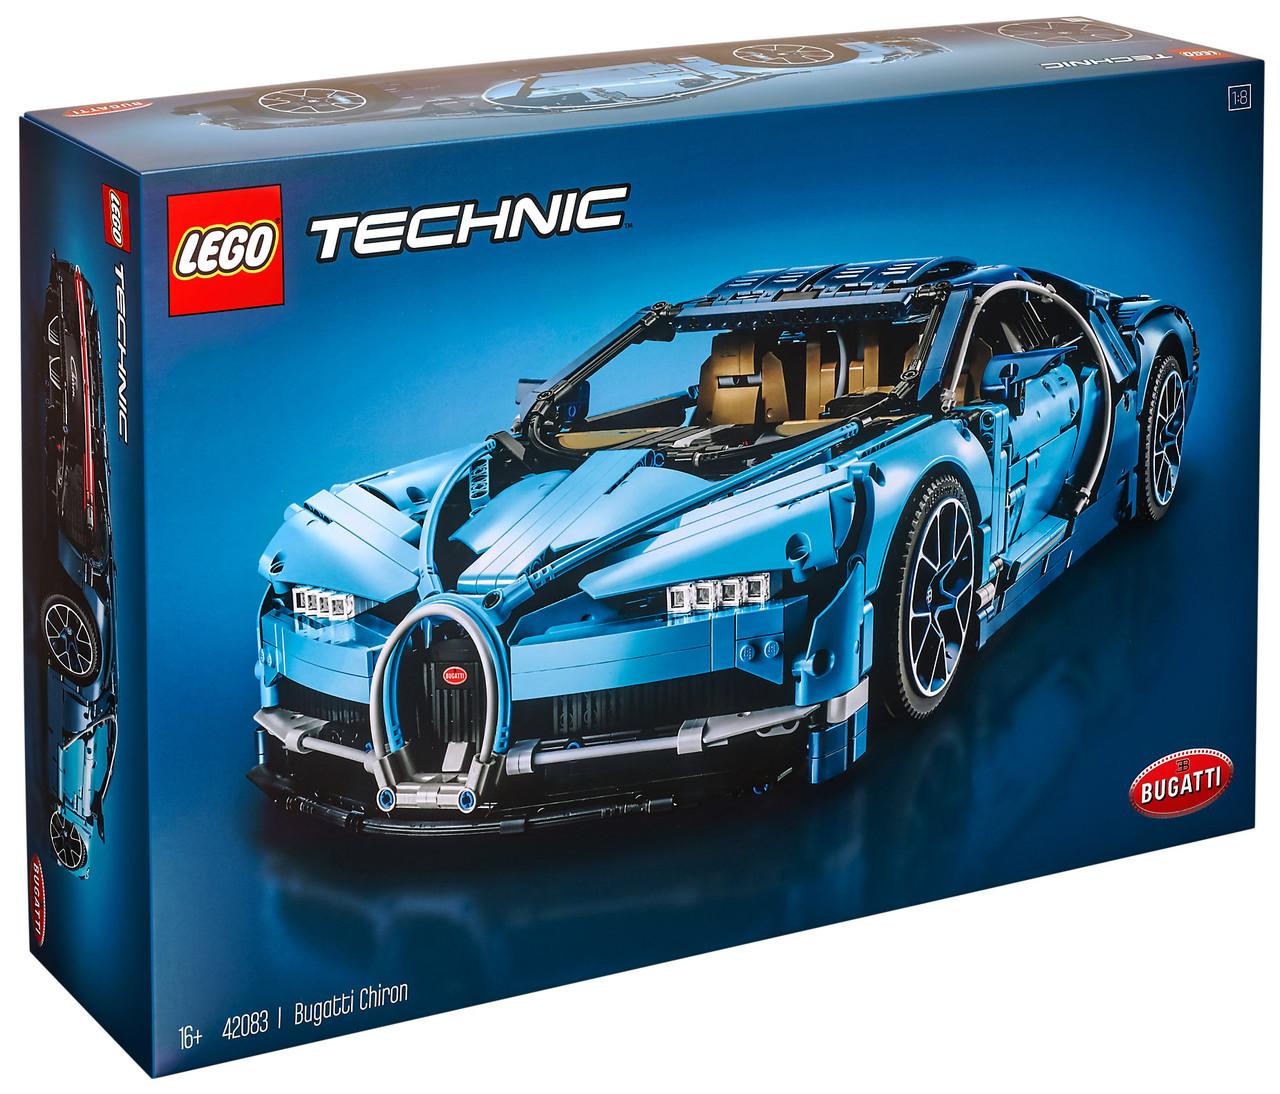 f71536afe6cf LEGO Technic Bugatti Chiron (42083), цена 8 295 грн., купить в Киеве ...